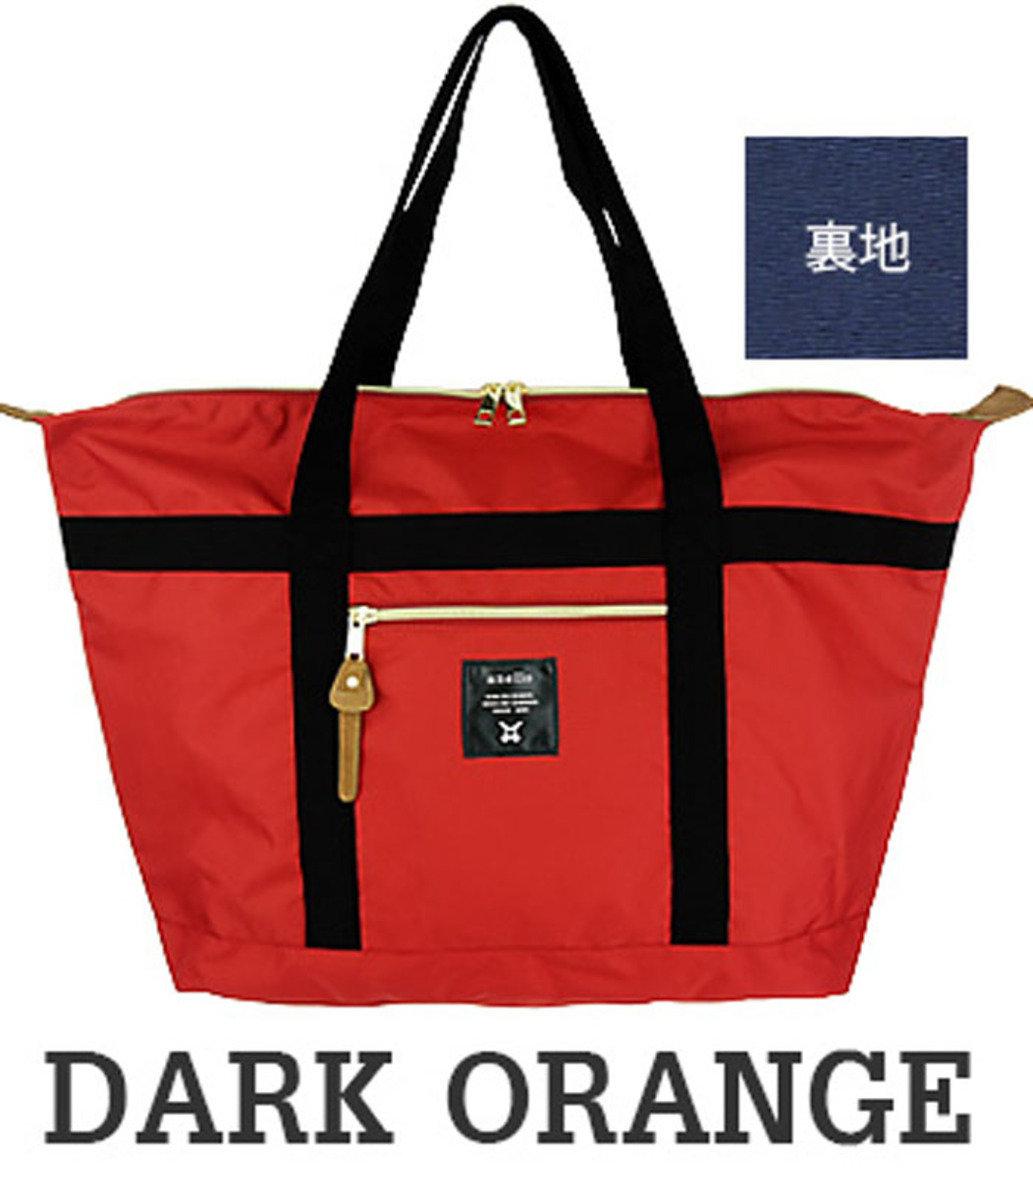 輕量帆布肩揹大袋 AT-B0196A-DOR-橙色